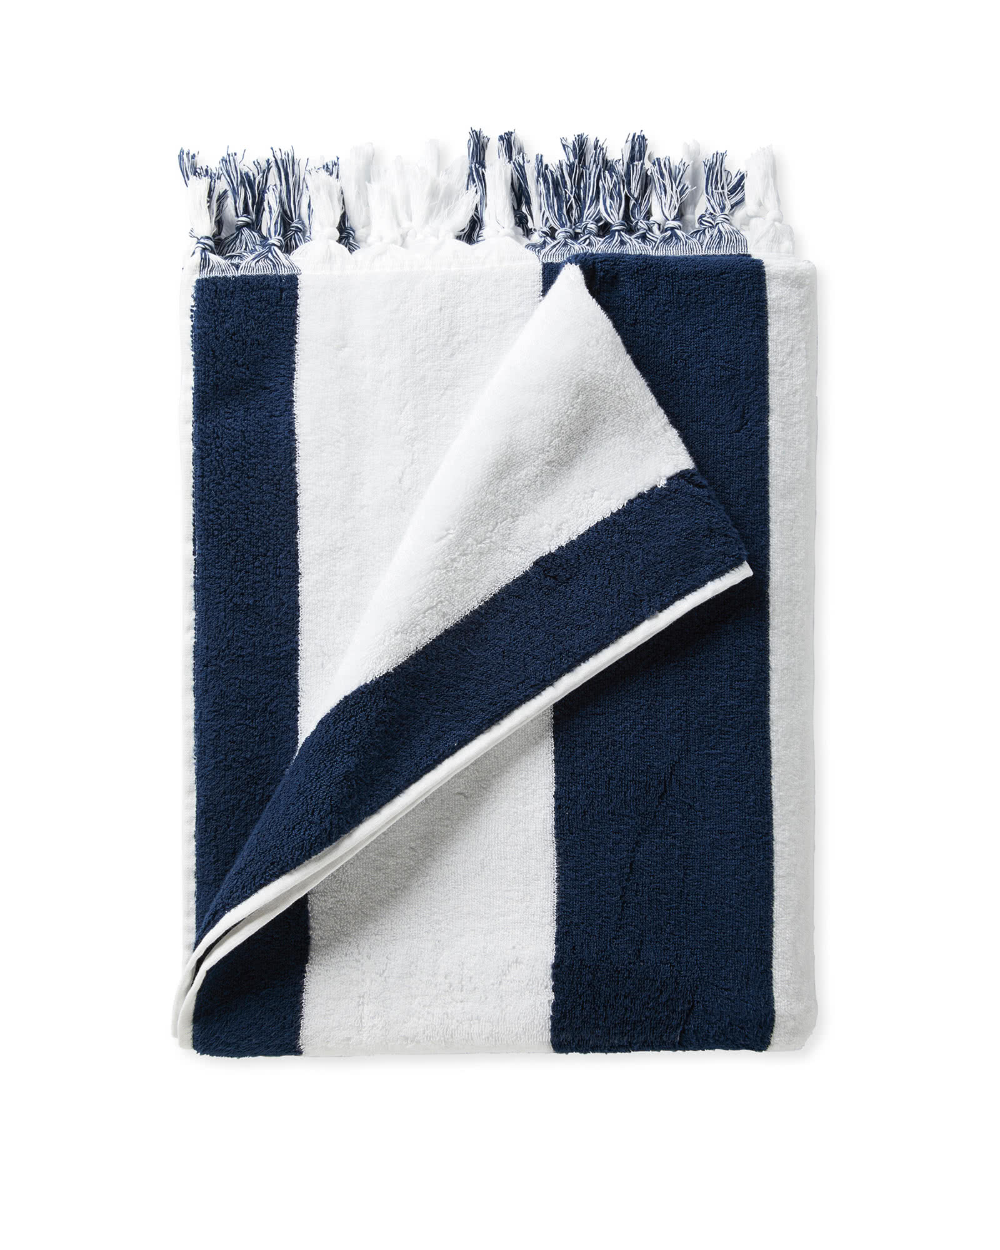 Vernazza Terry Towel Towels Beige Turkish Towels Beach Towel